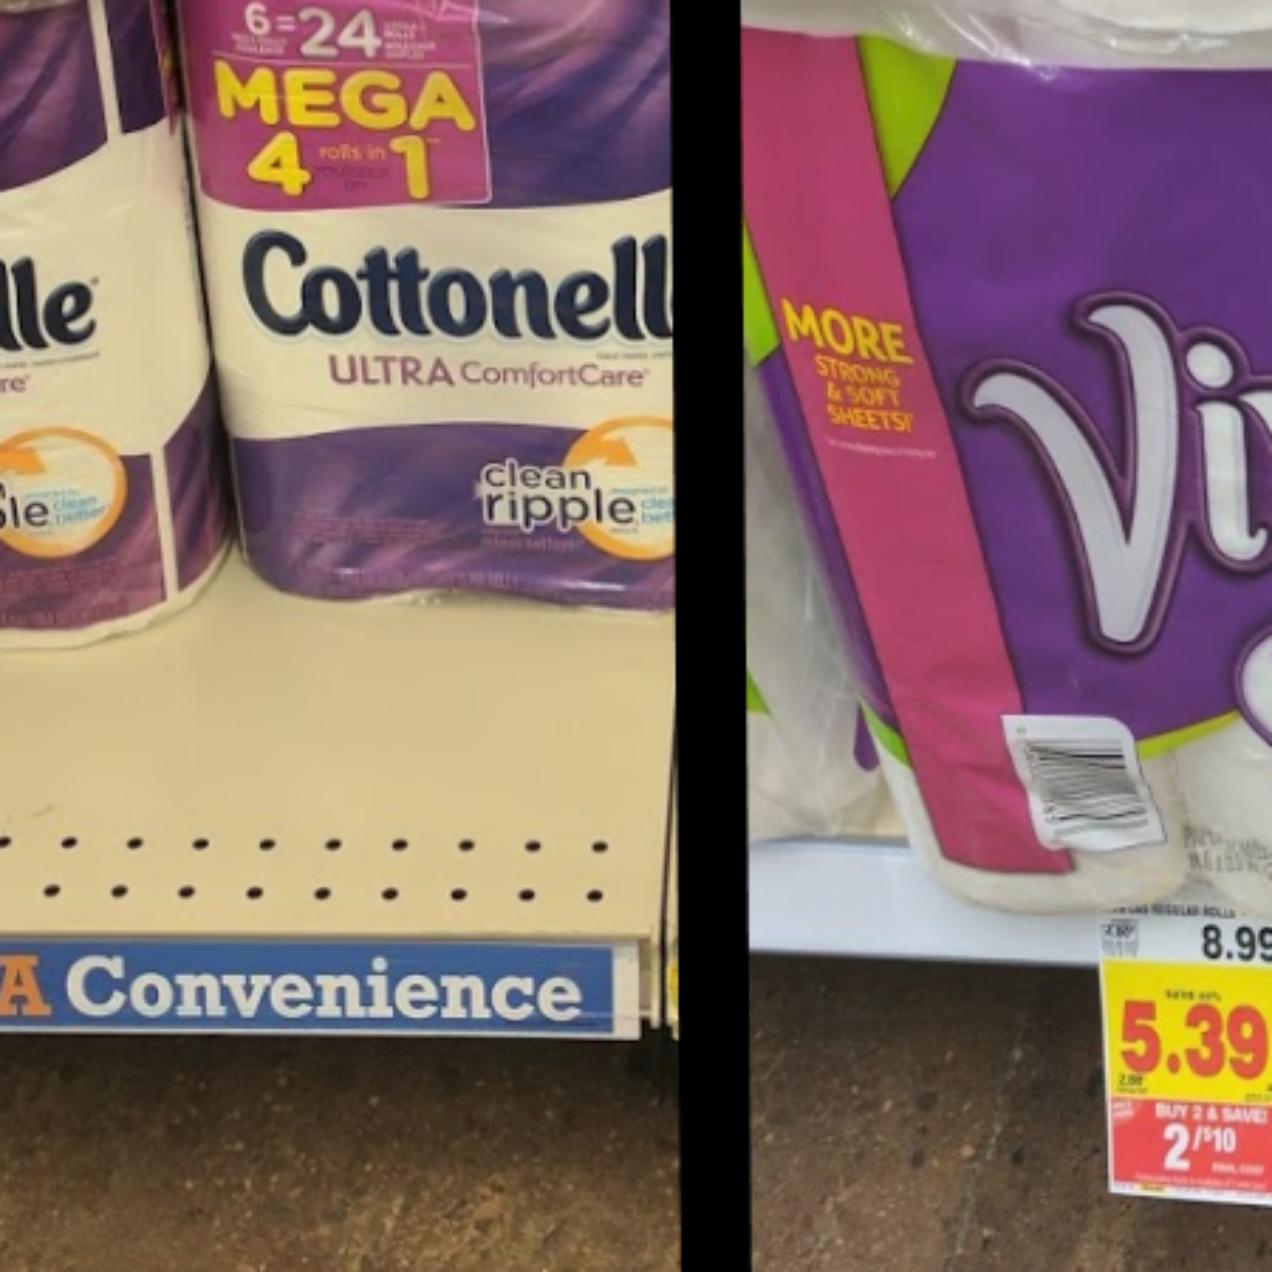 Cottonelle, Scott & Viva Packs as low as $4 at Kroger (Regular up to $10.99)